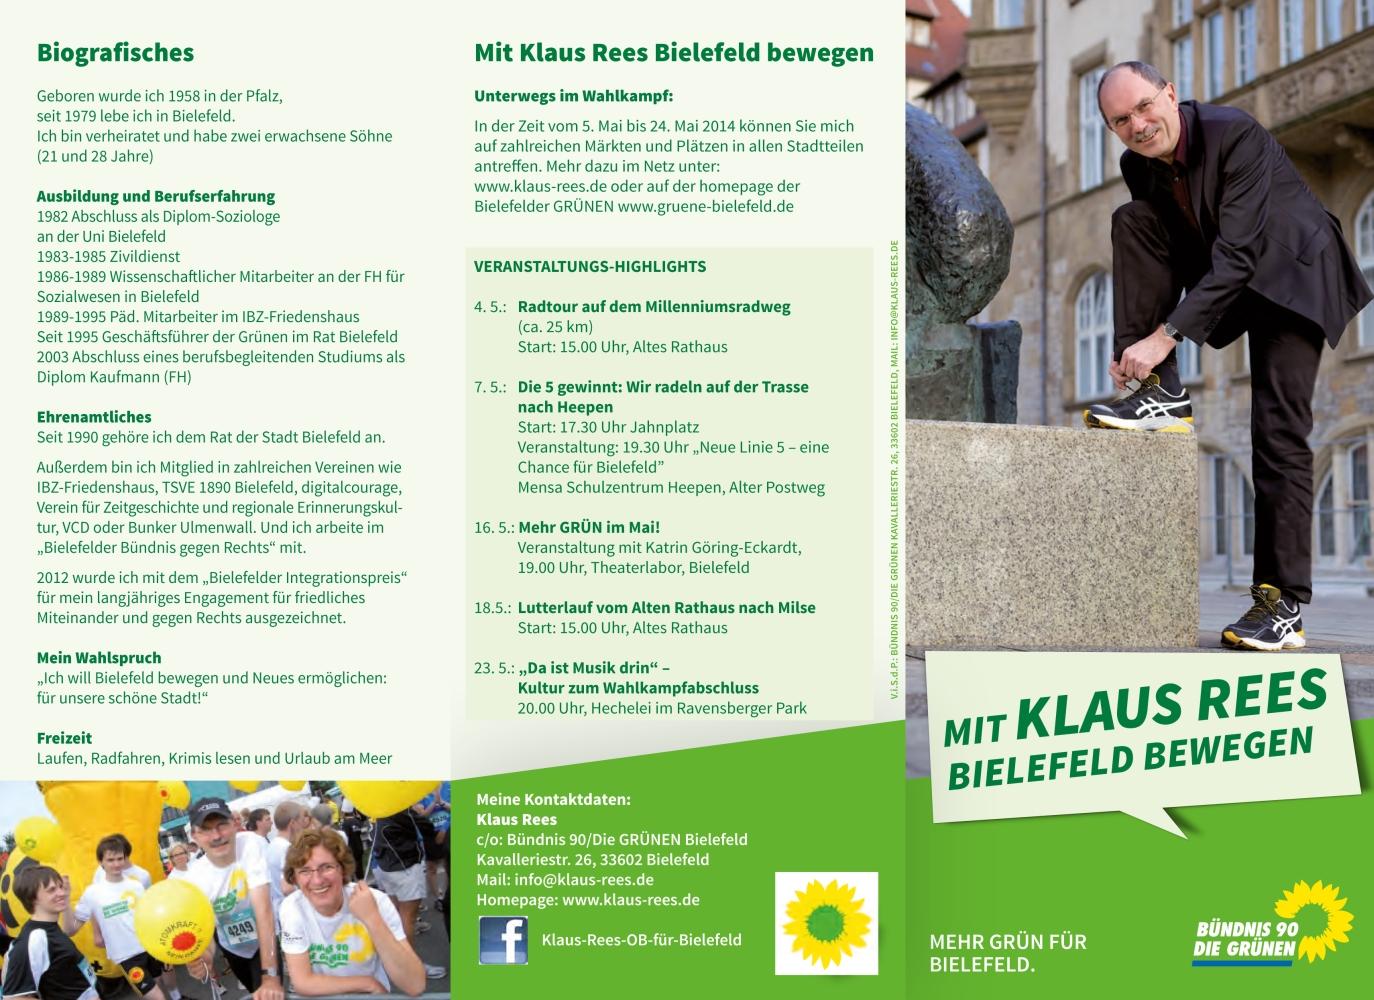 Mit-Klaus-Rees-Bielefeld-bewegen-1